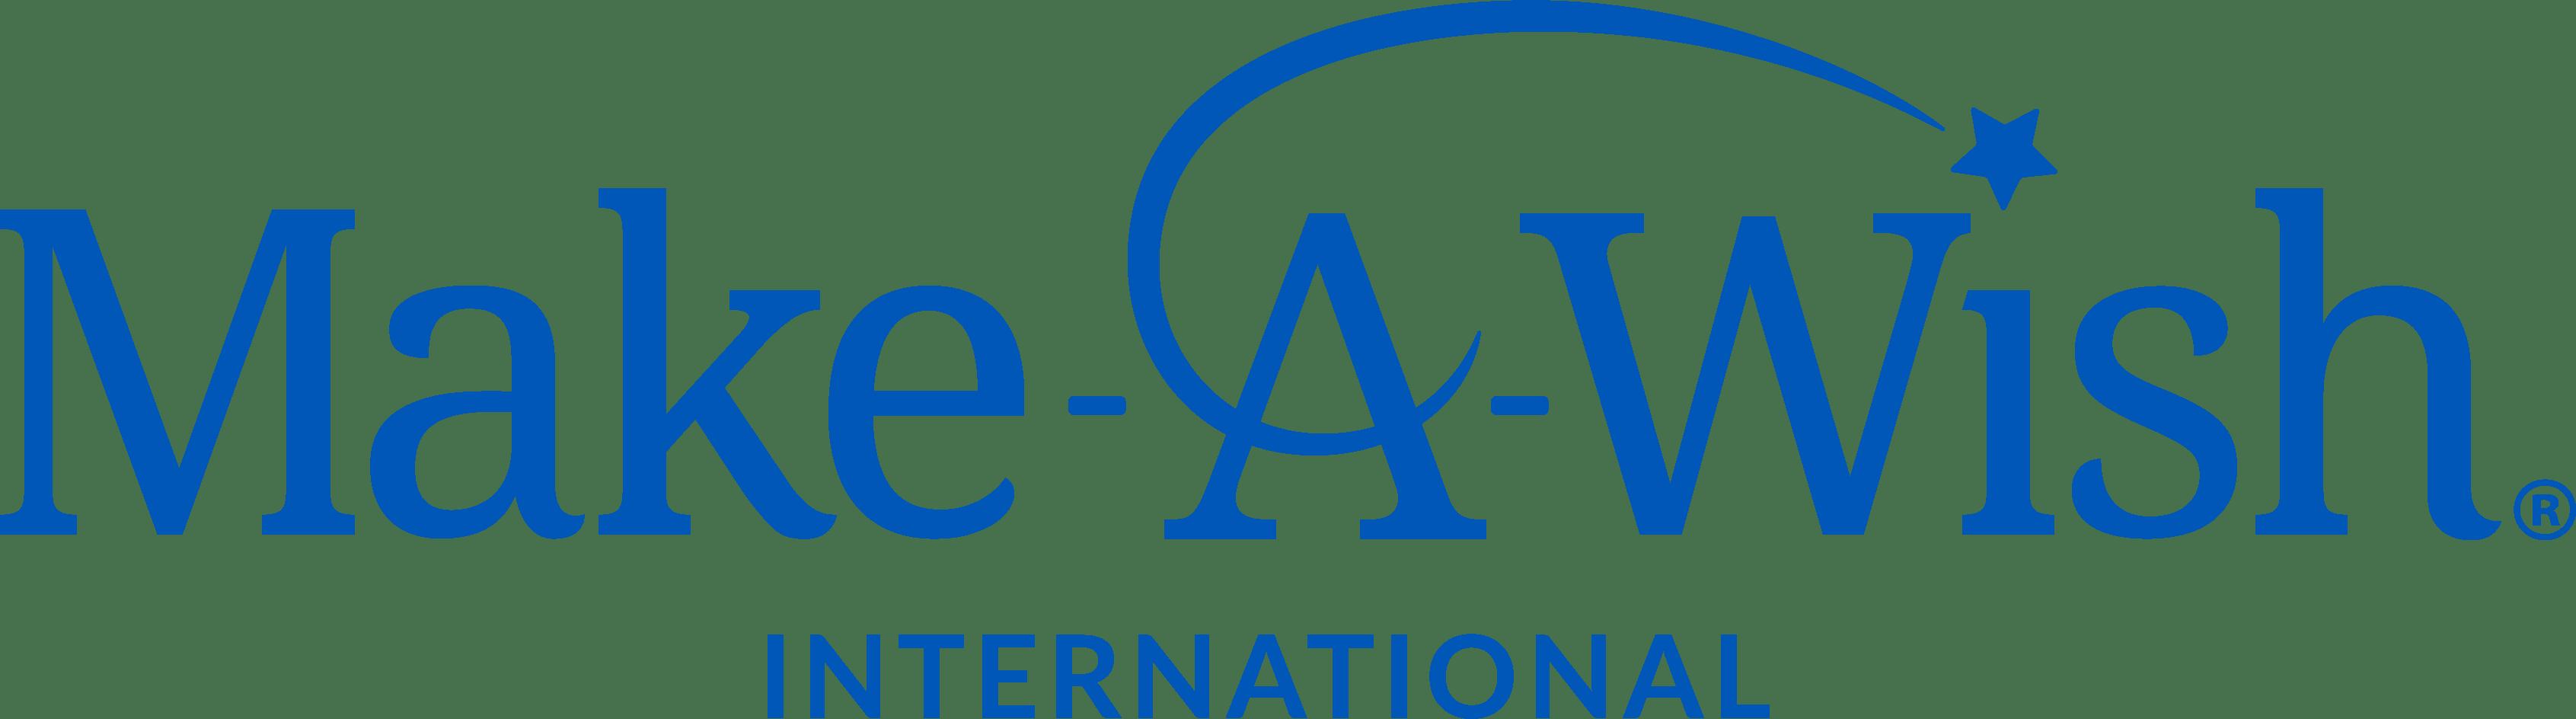 Make-A-Wish Foundation International